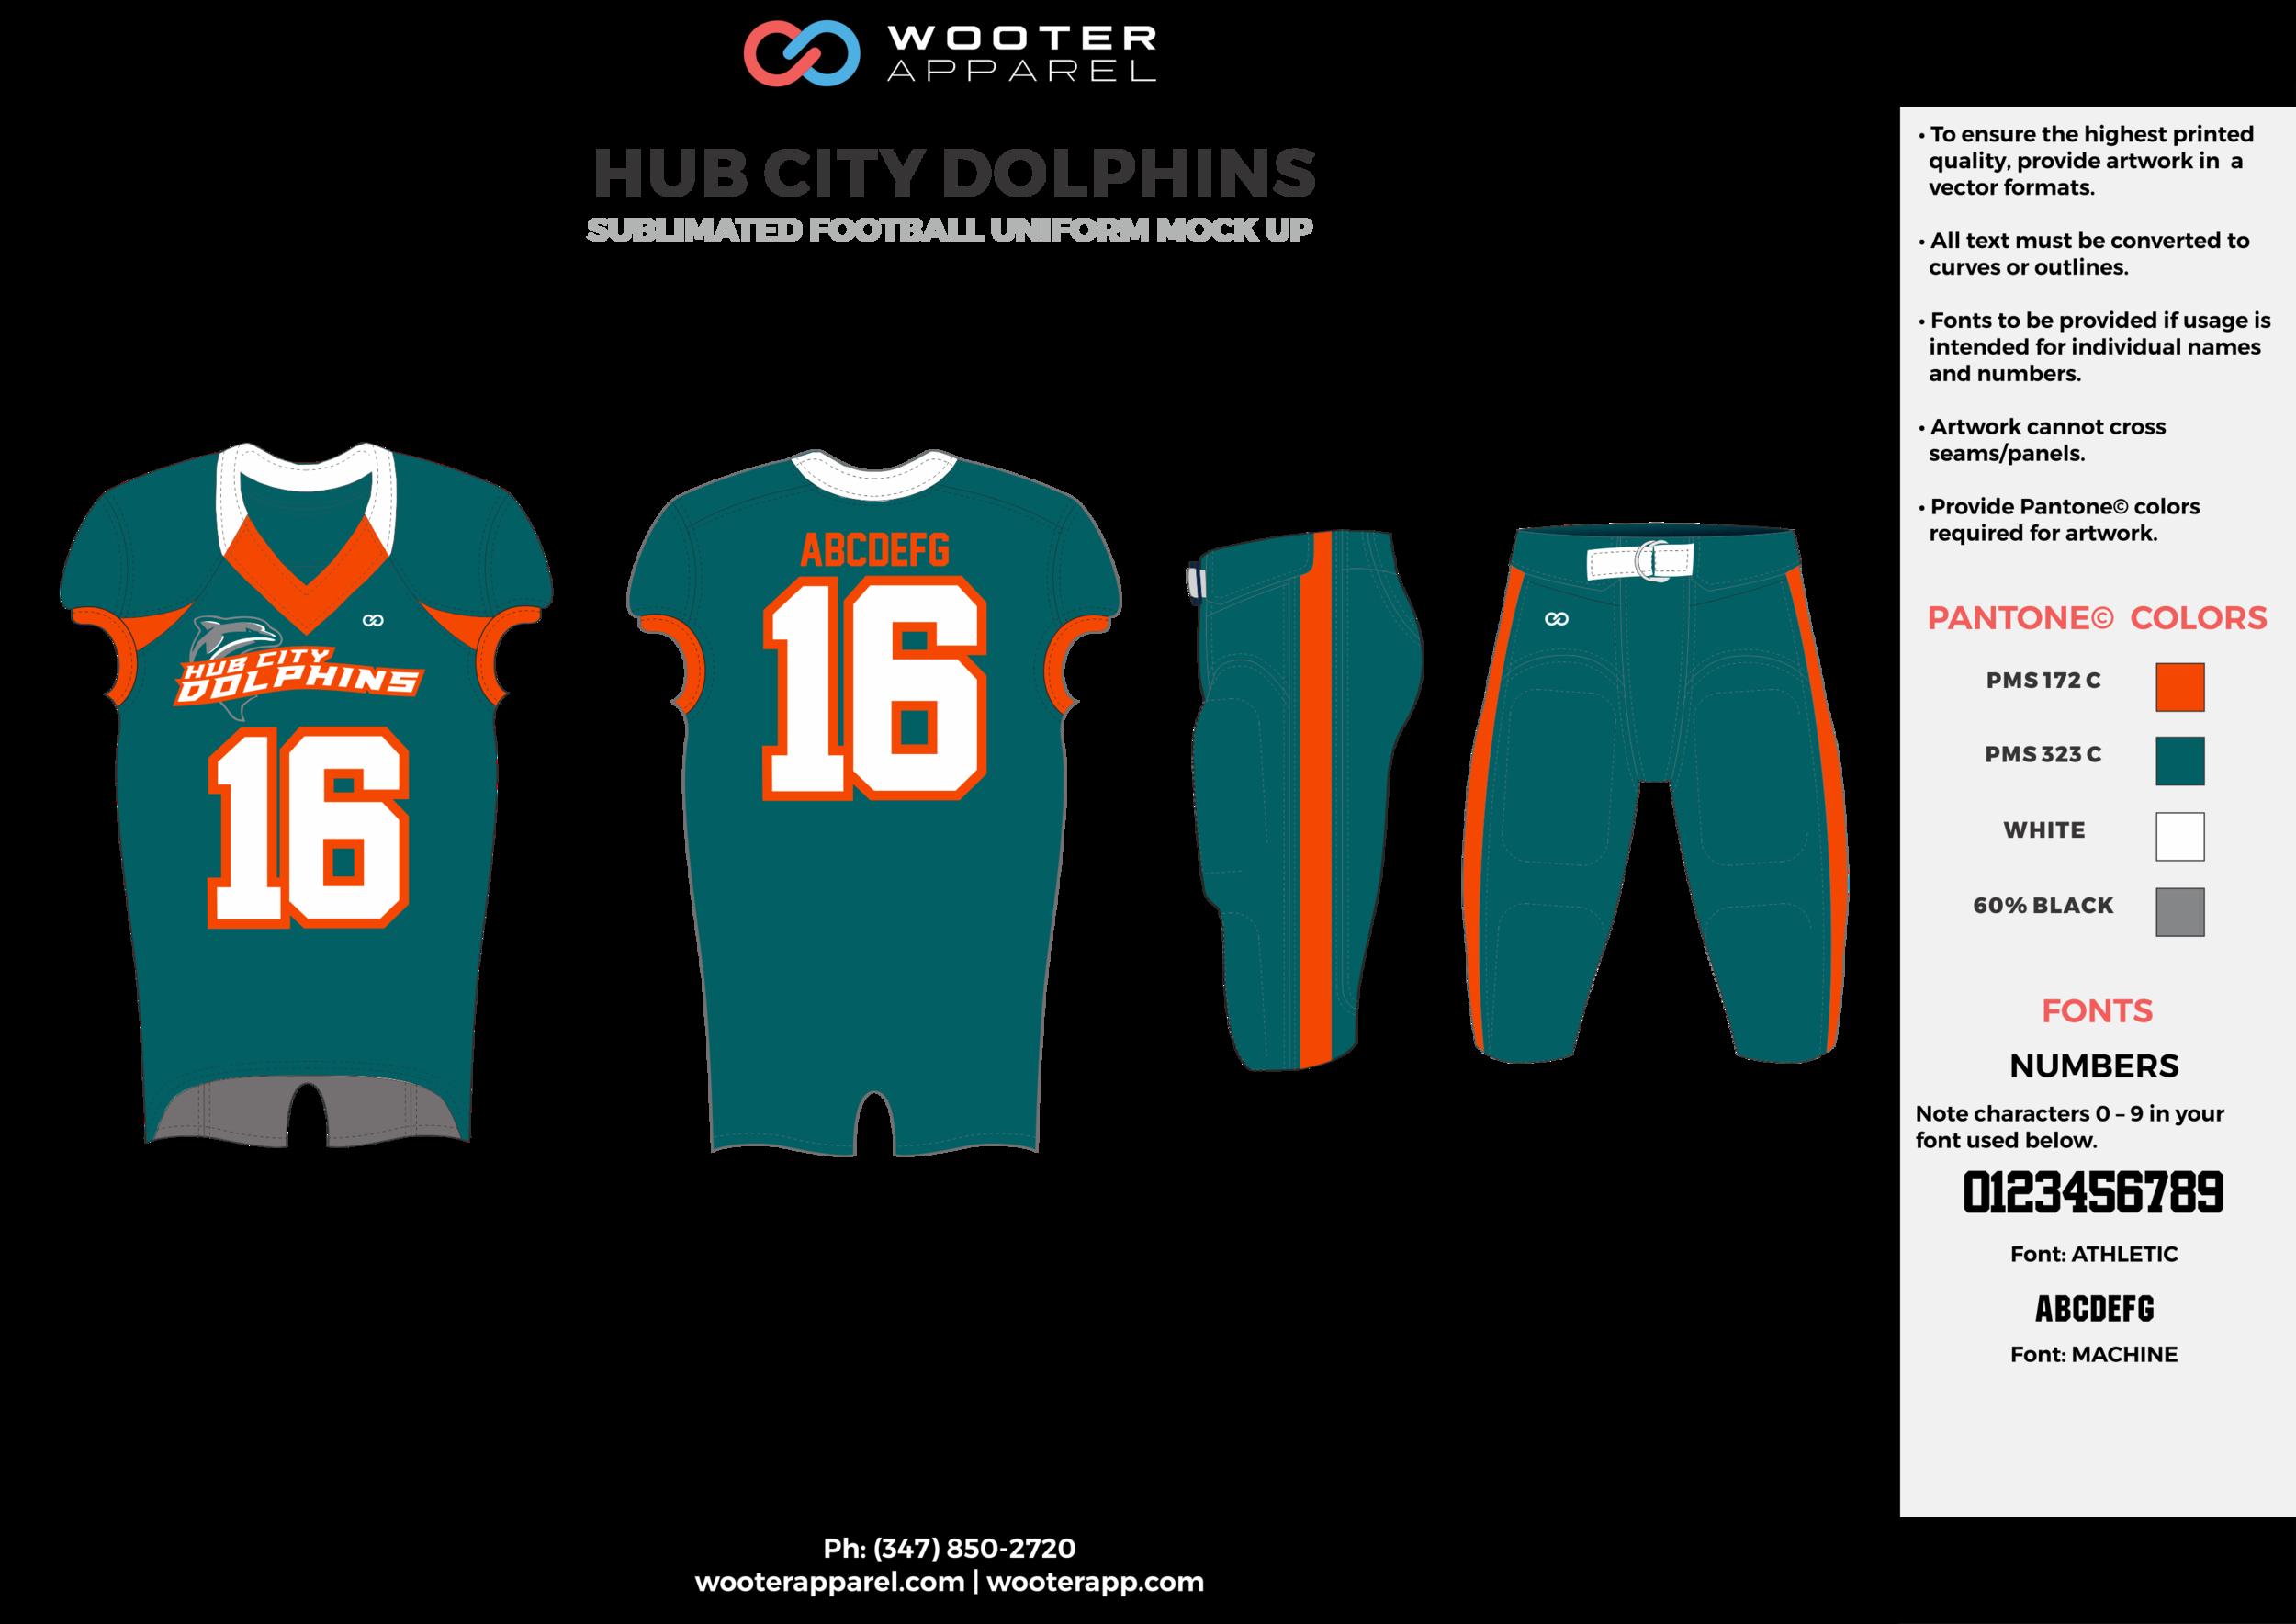 HUB CITY DOLPHINS water blue orange white gray football uniforms jerseys pants